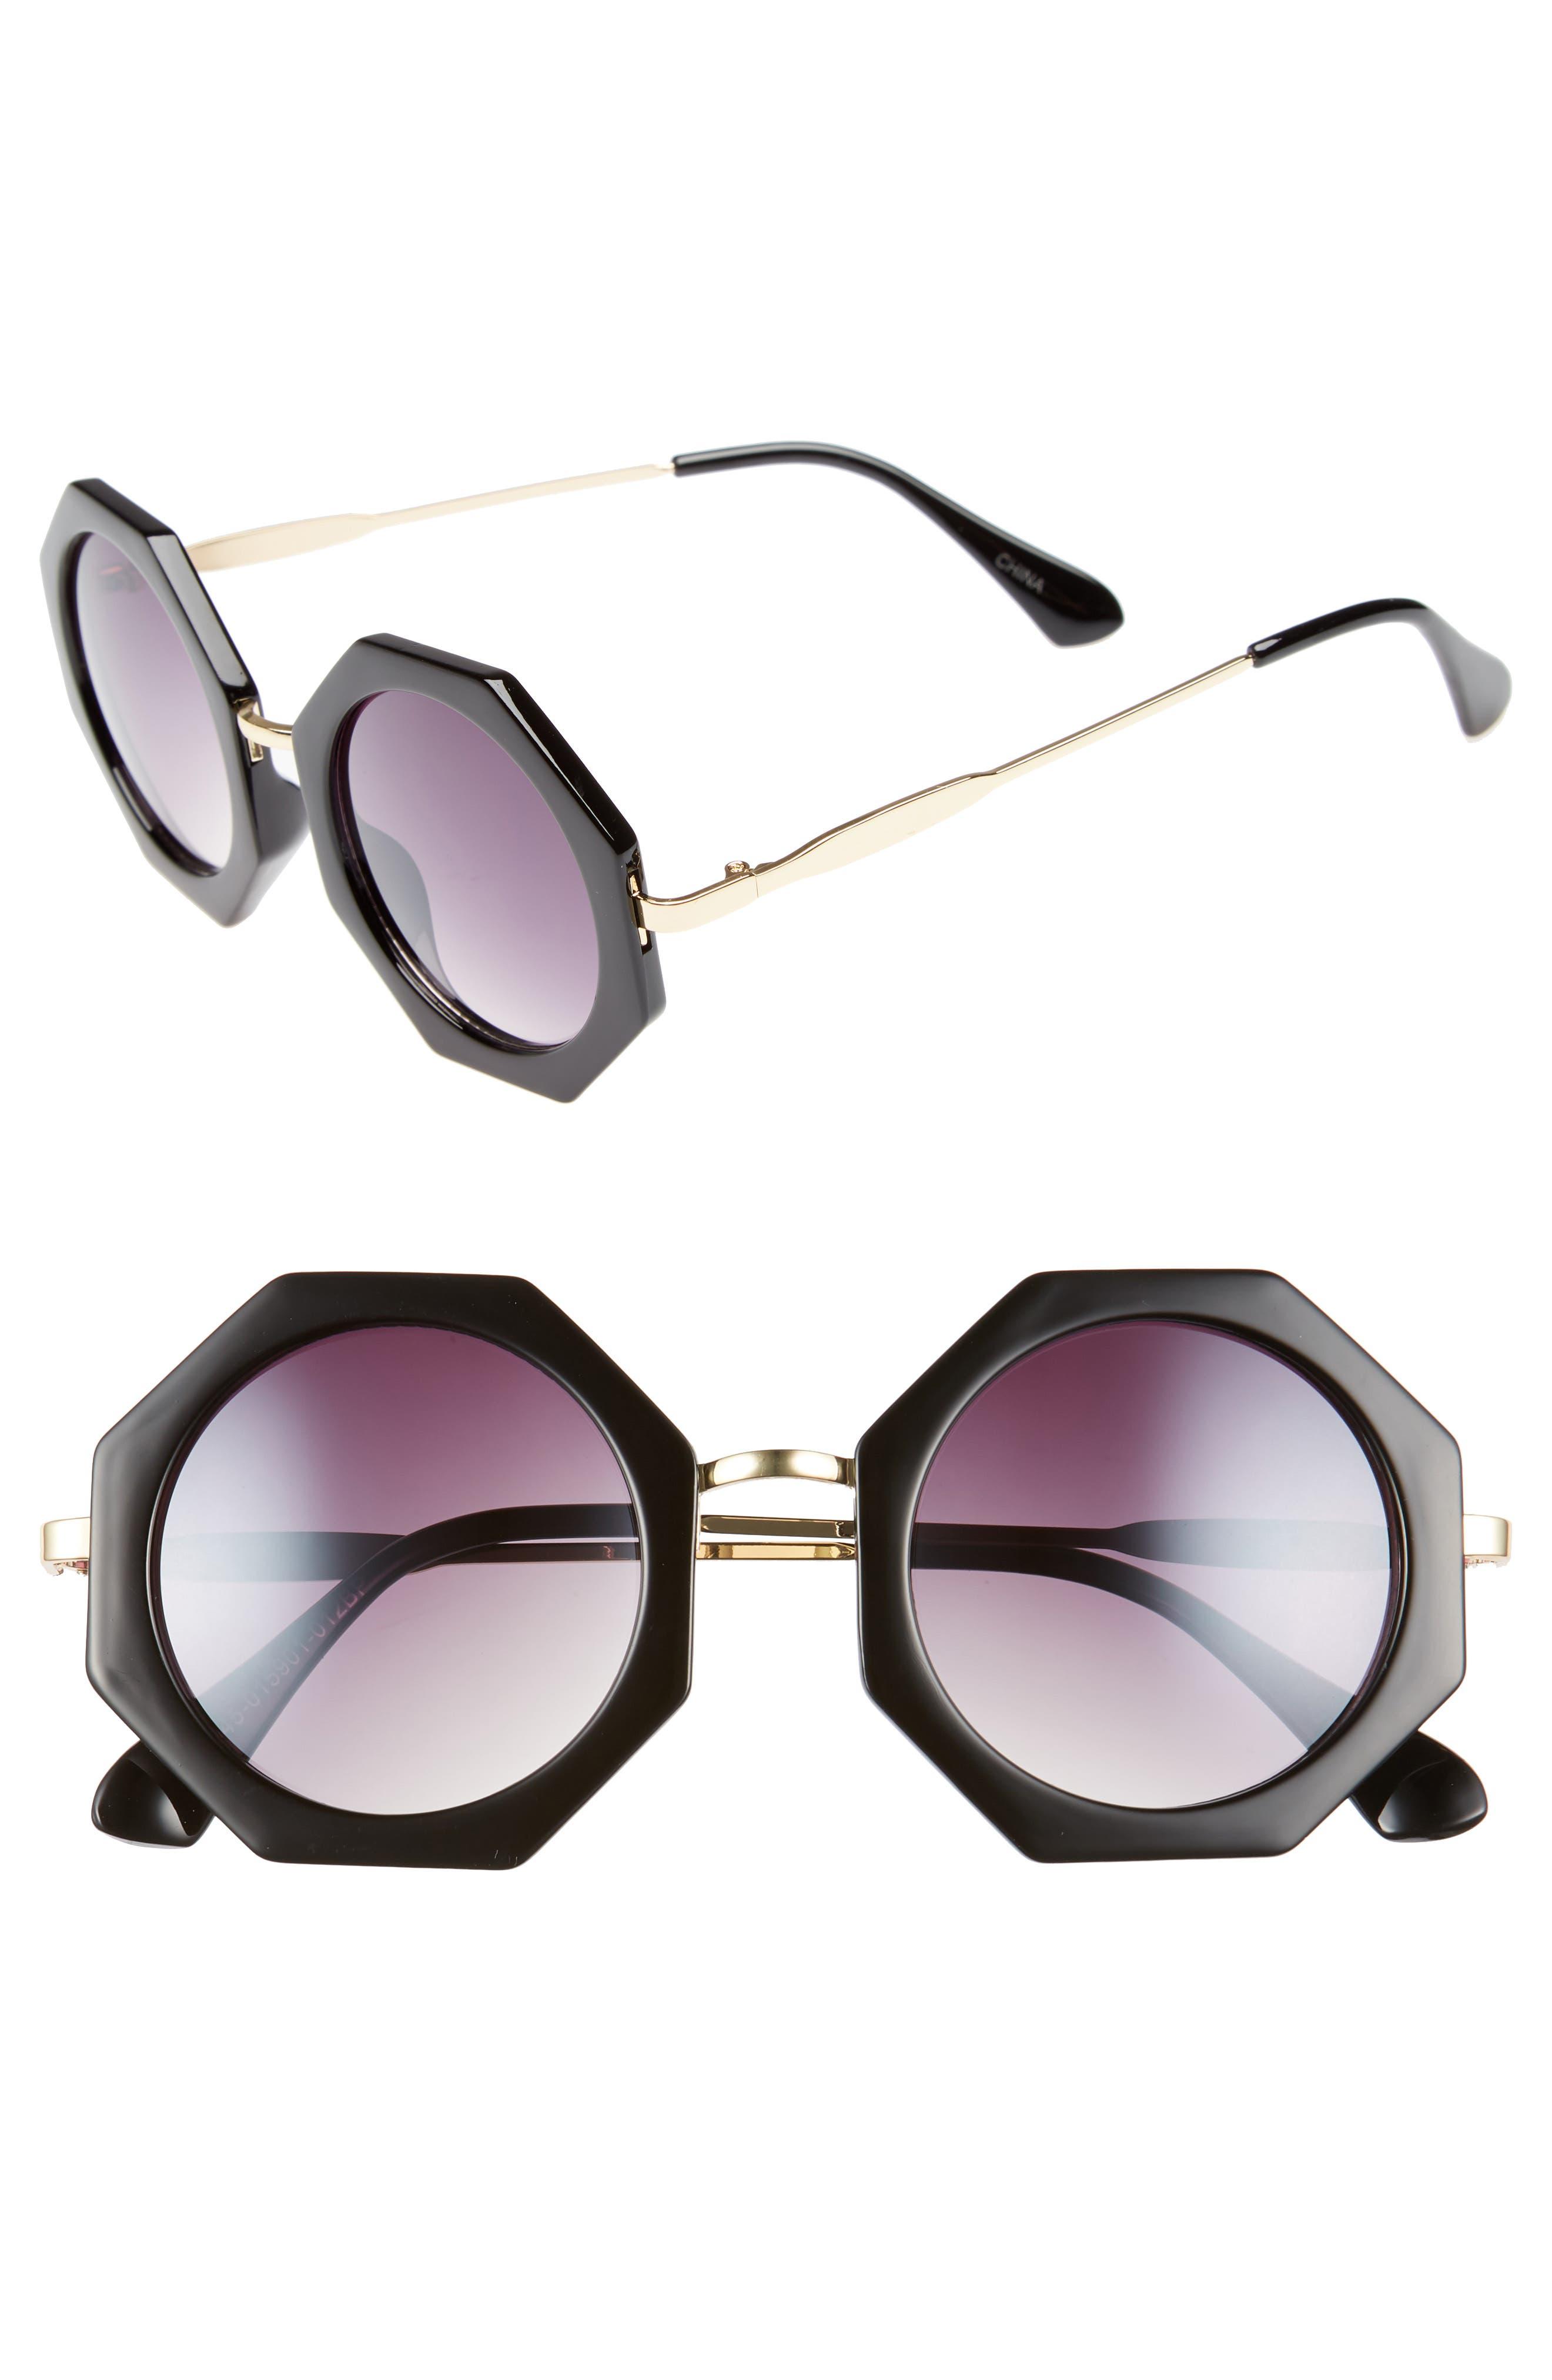 54m Hexagonal Sunglasses,                             Main thumbnail 1, color,                             001